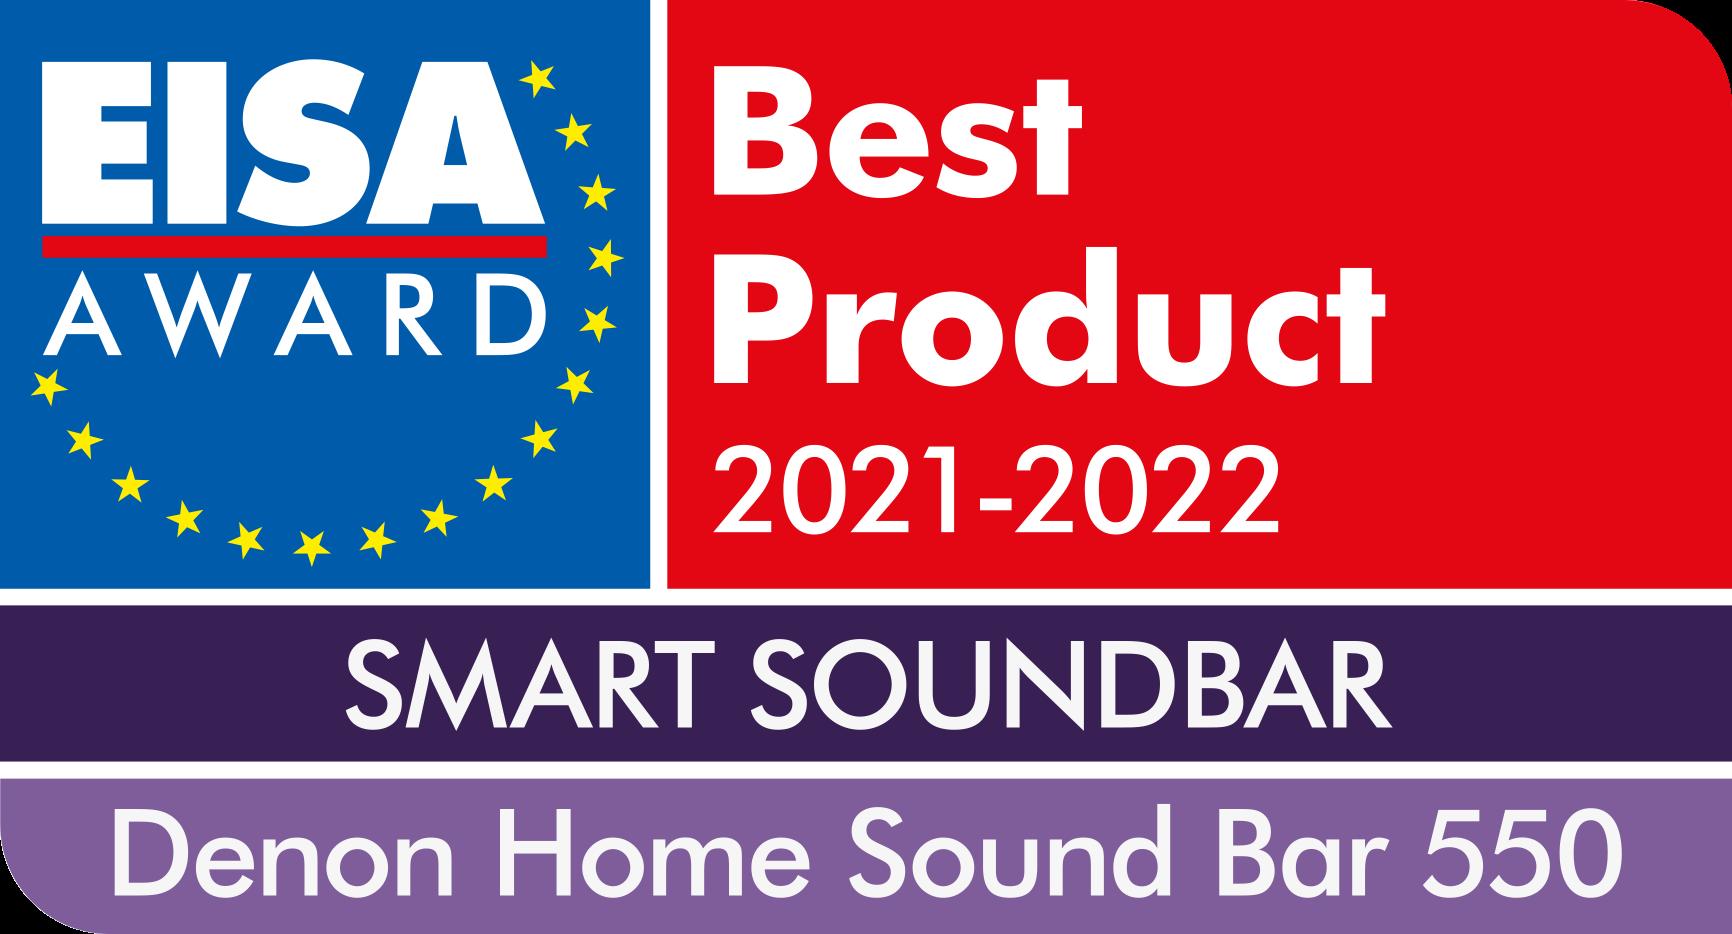 Nagrody EISA 2021-2022 rozdane!, Denon Store